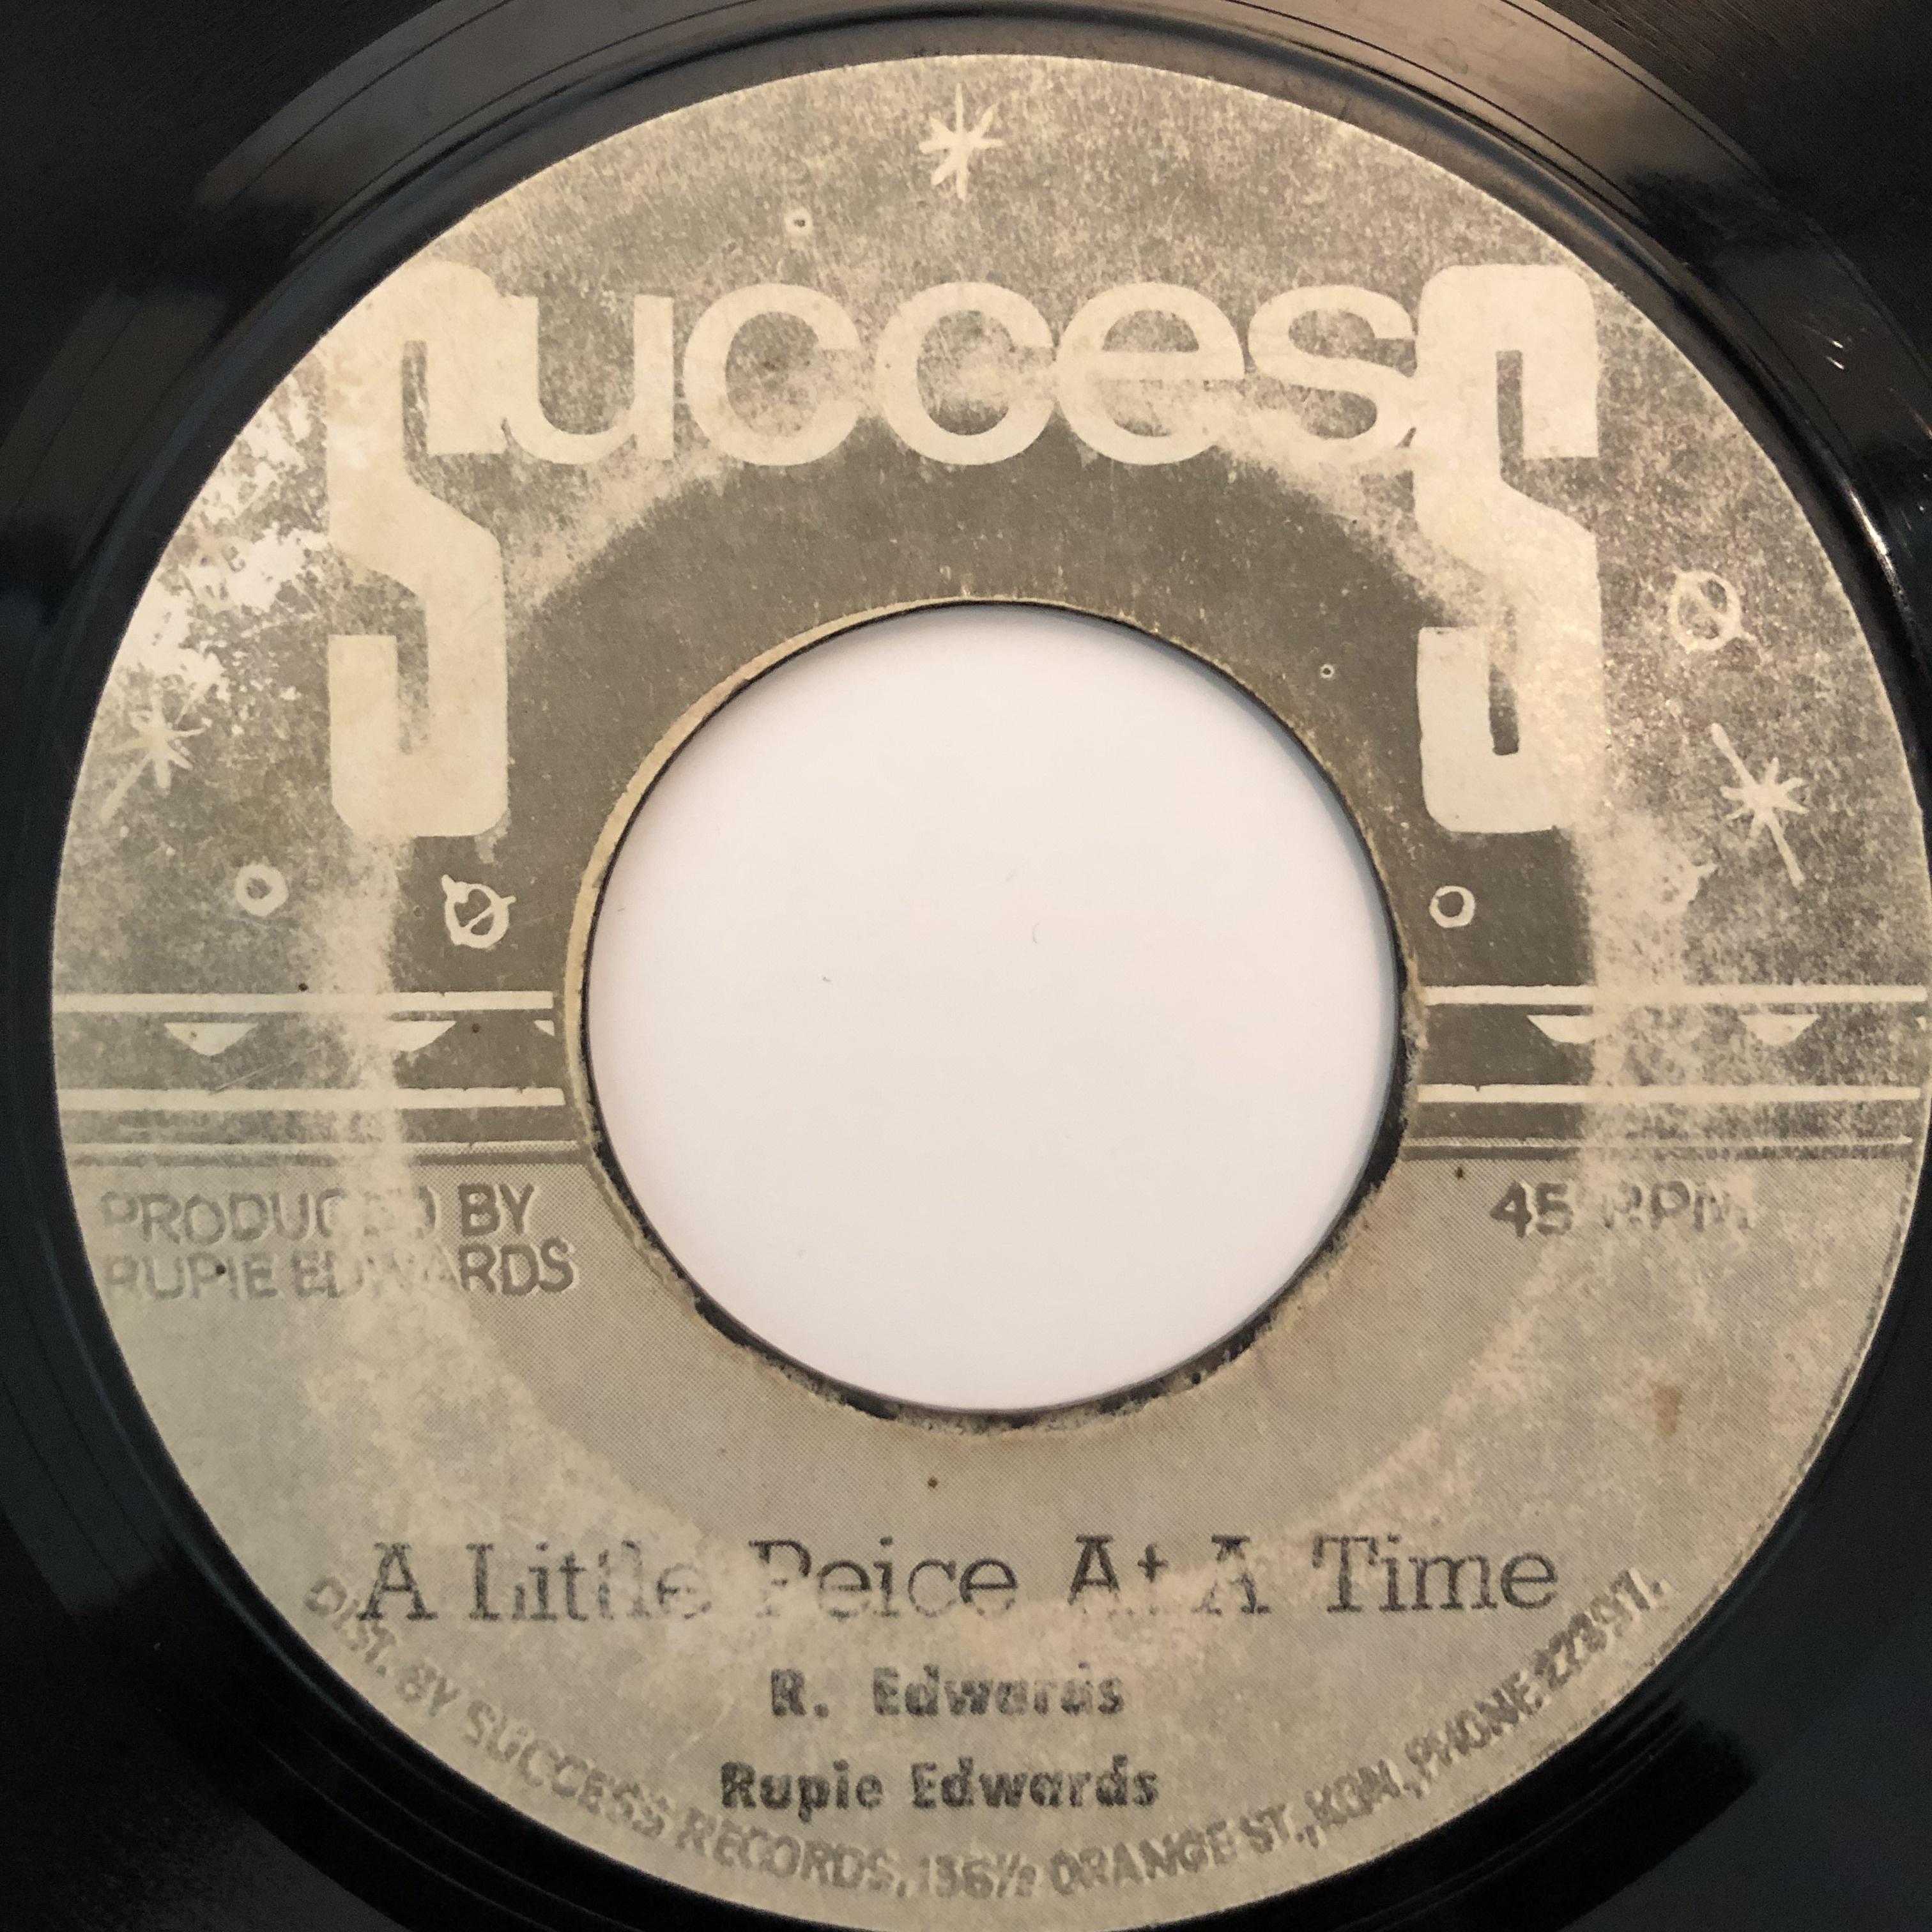 Rupie Edwards - A Little Piece At A Time【7-20332】